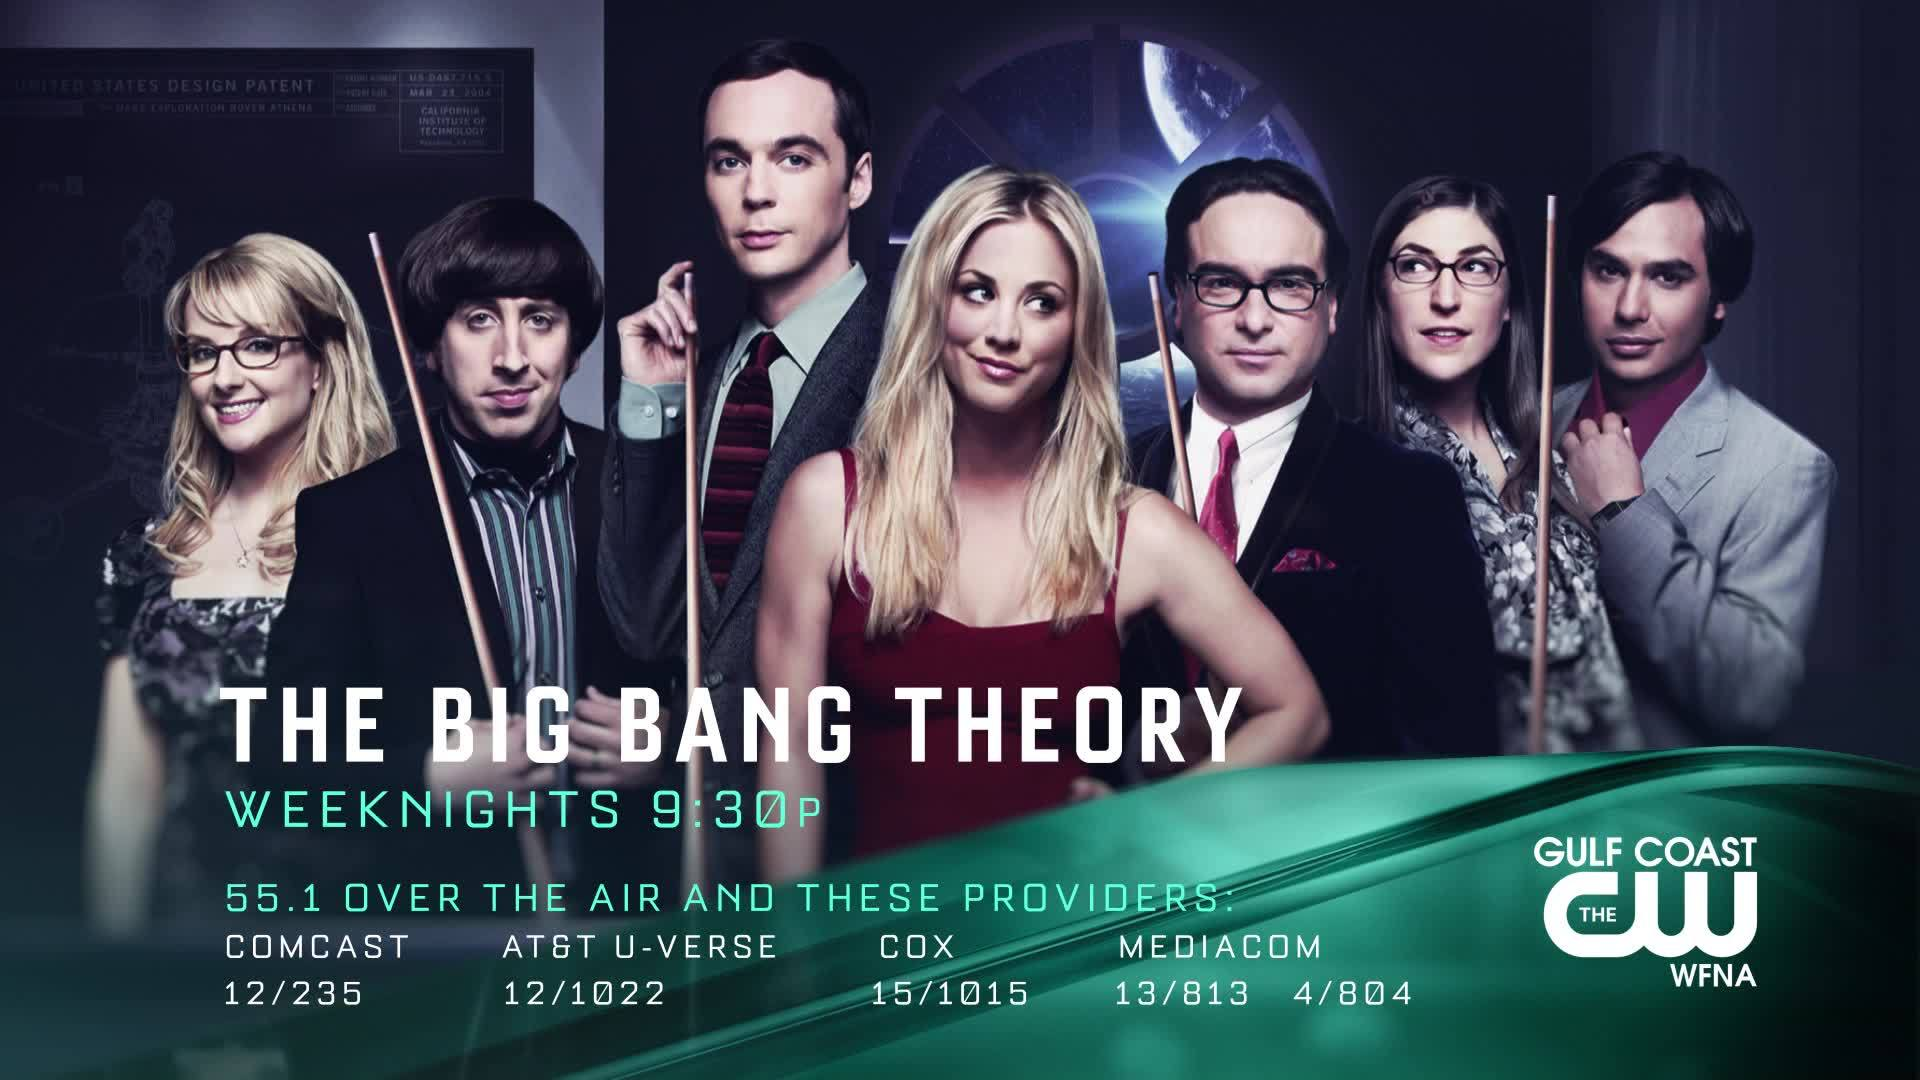 Big Bang Theory Now on The Gulf Coast CW!